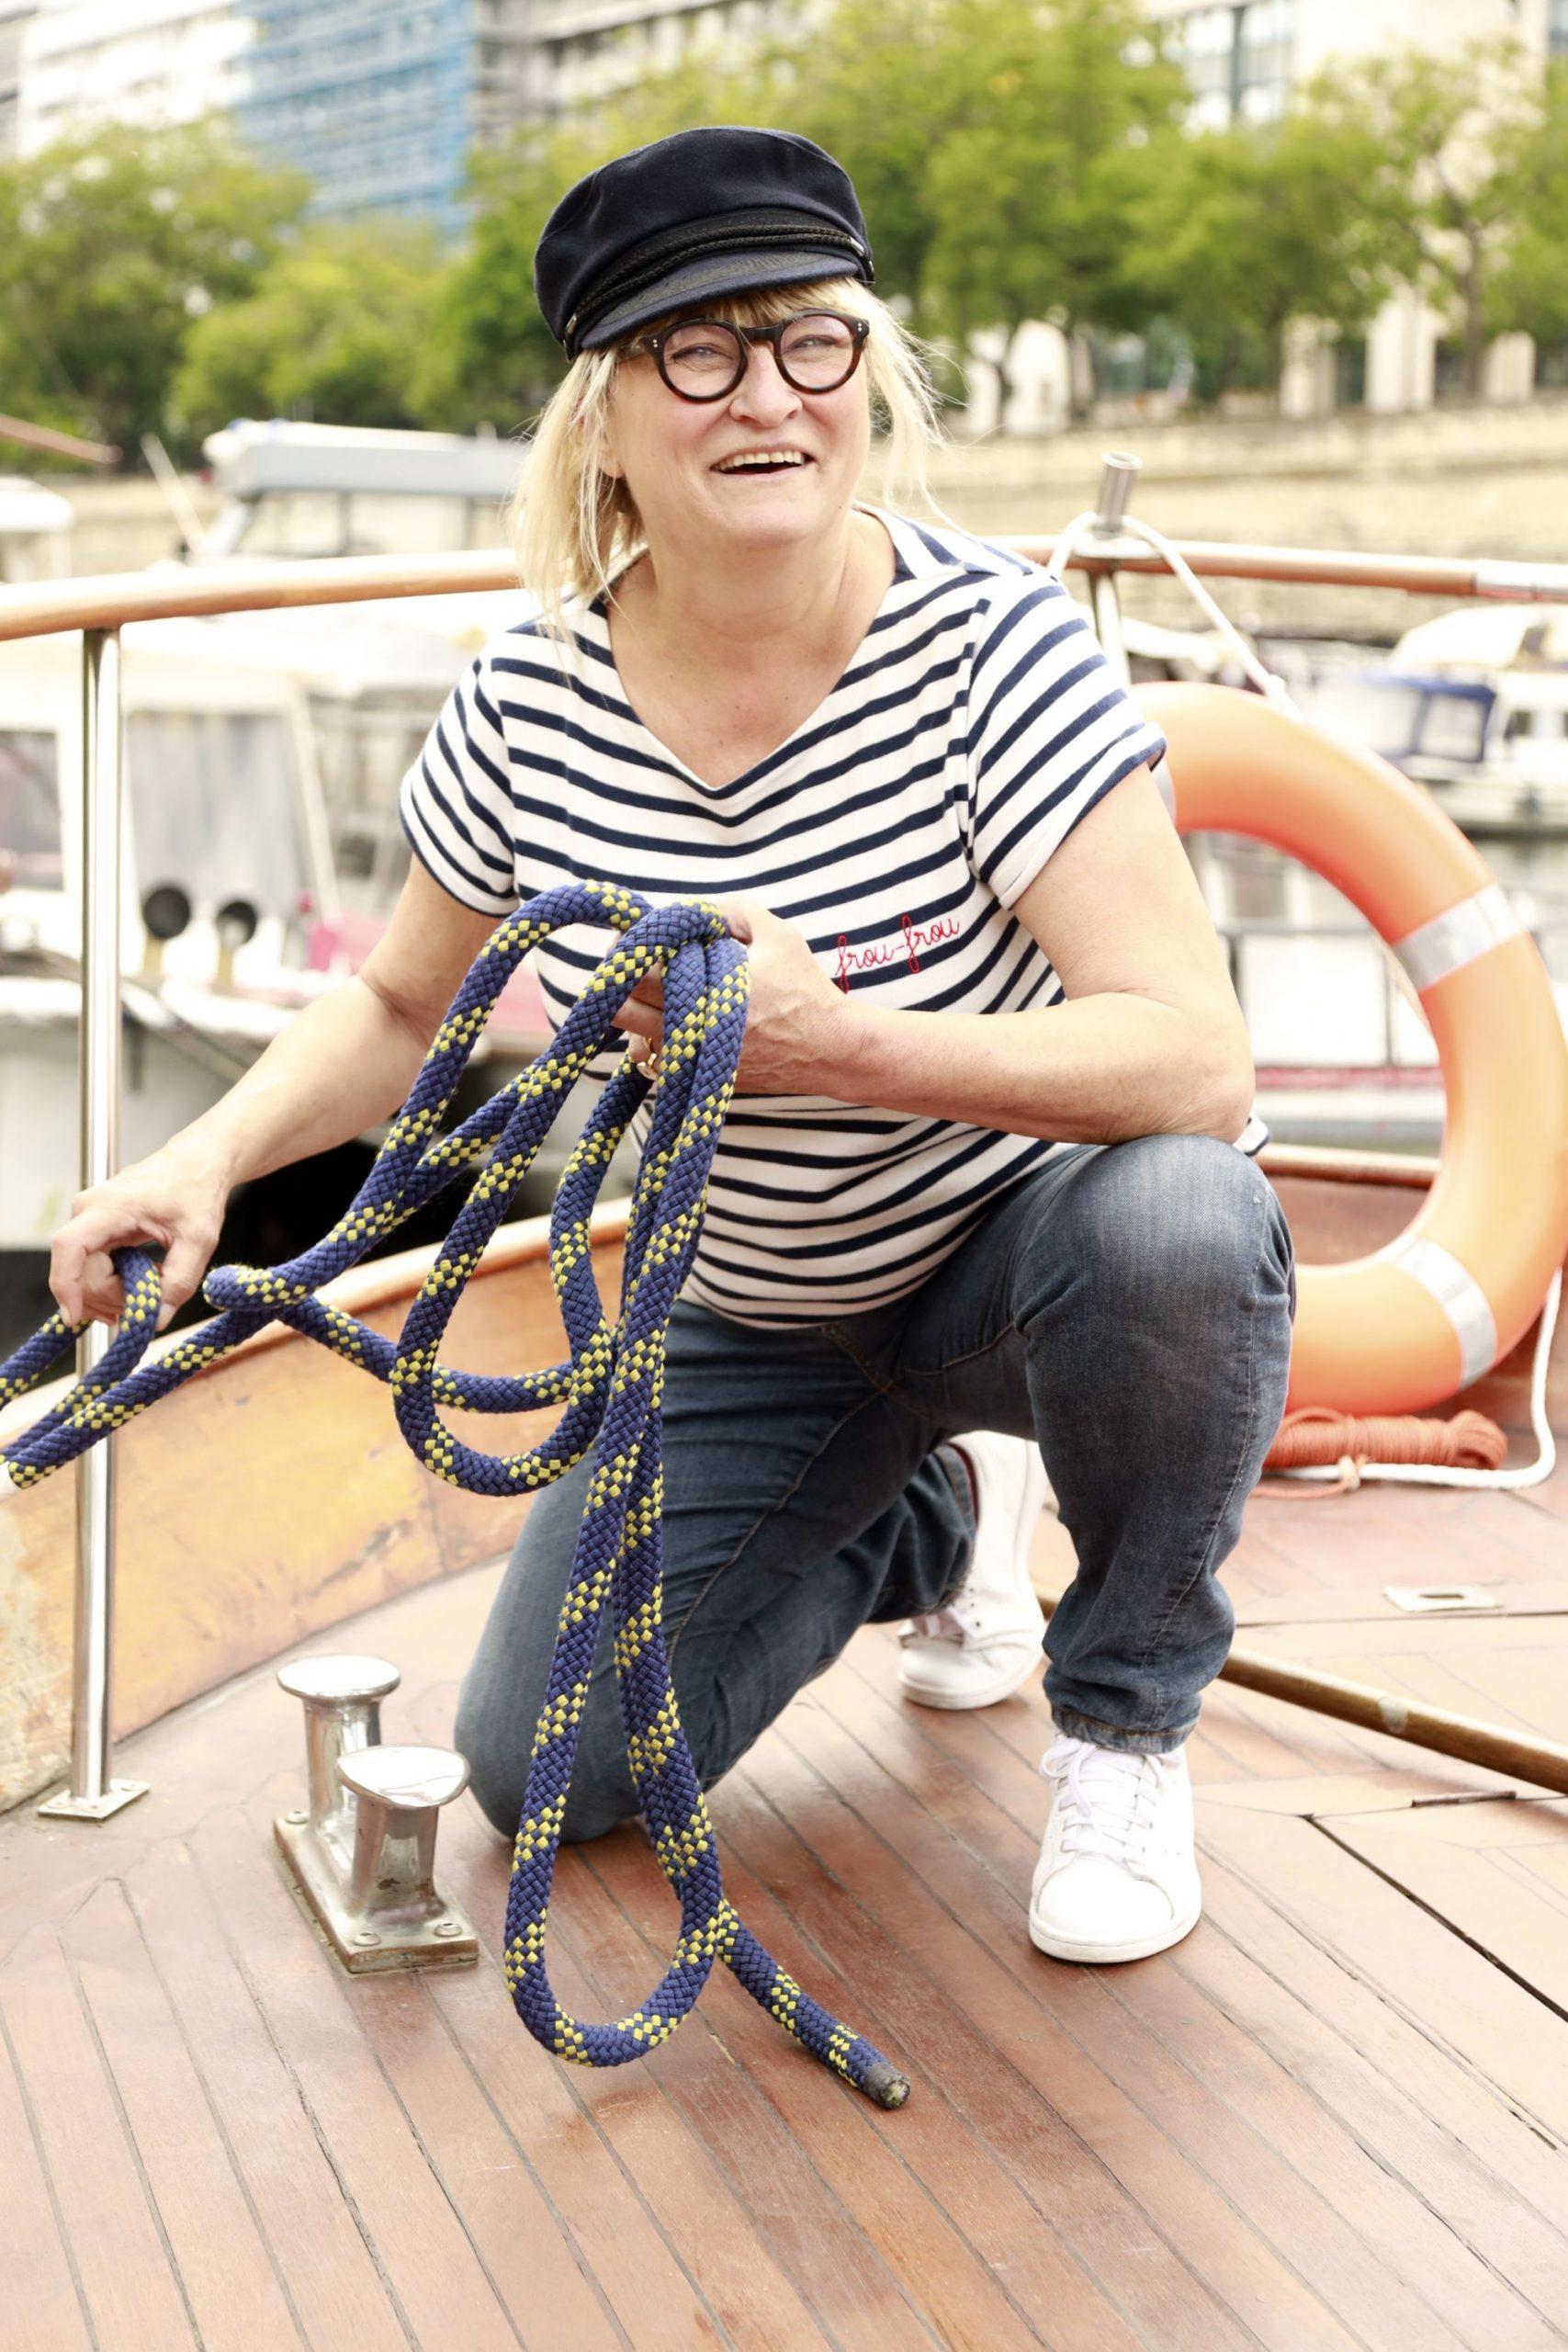 Christine Bravo amarrage de bateau.